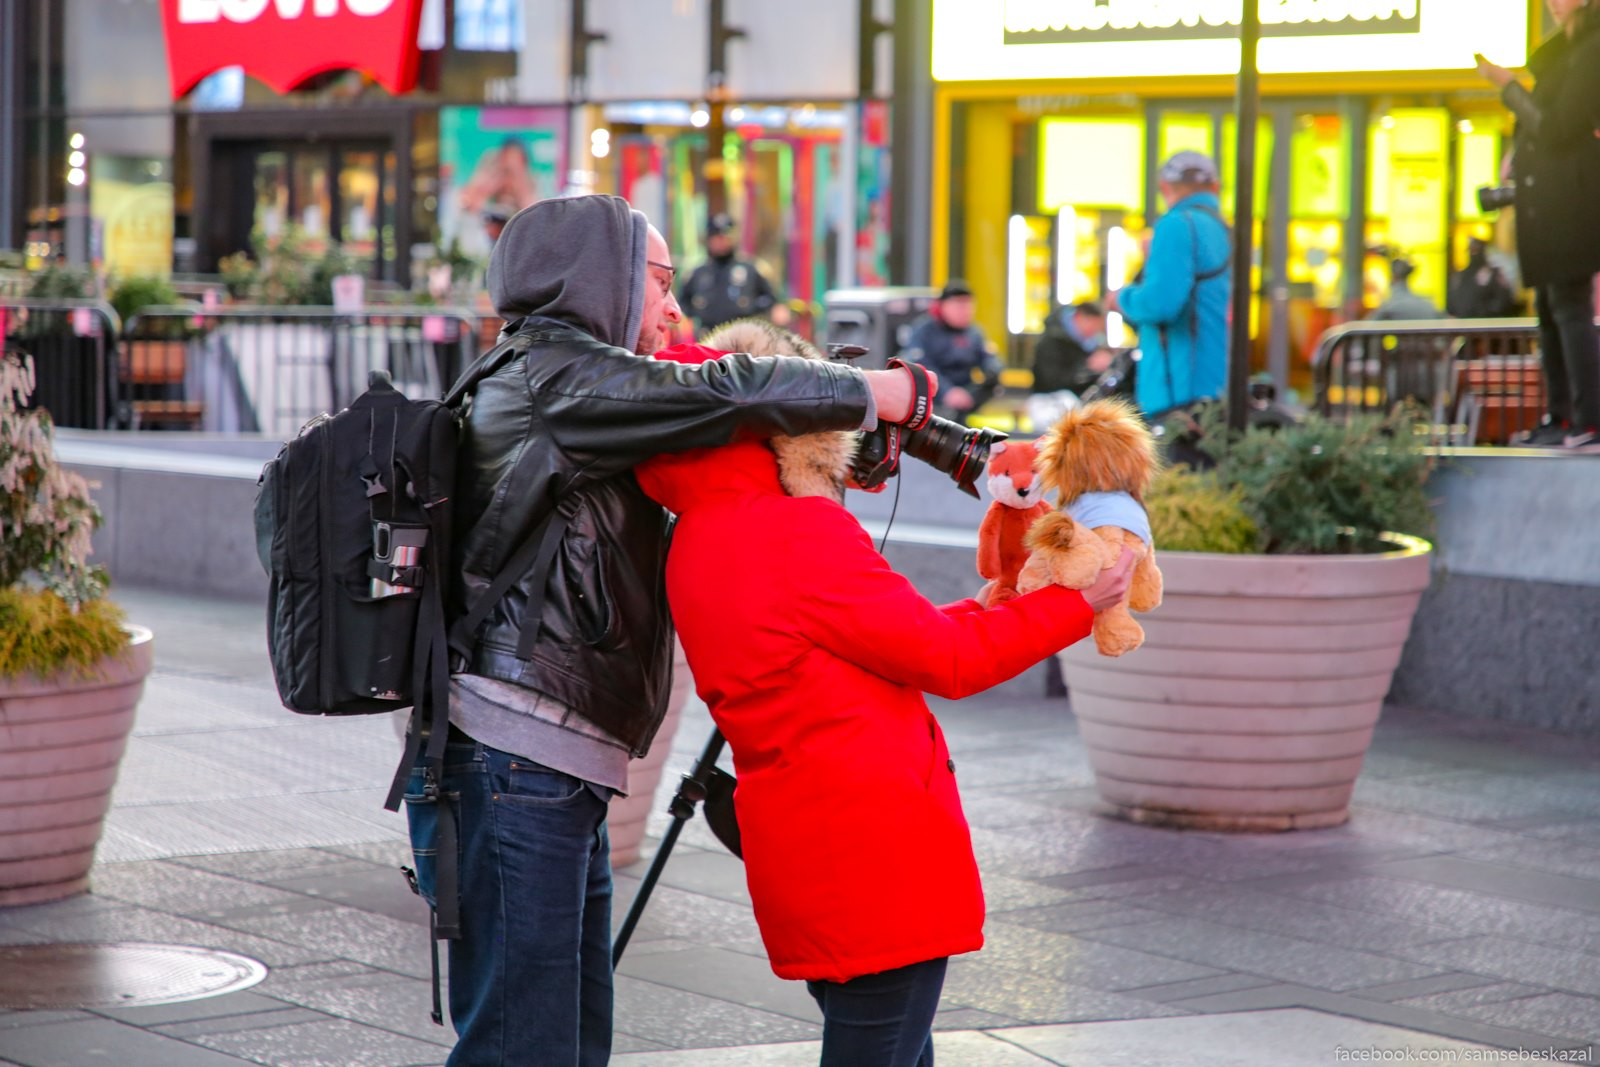 Na Tajms-skver tolʹko policia, da nemnogocislennye fotografy s blogerami. Kto-to vot plusevye igruski fotaet na fone proishodasego.